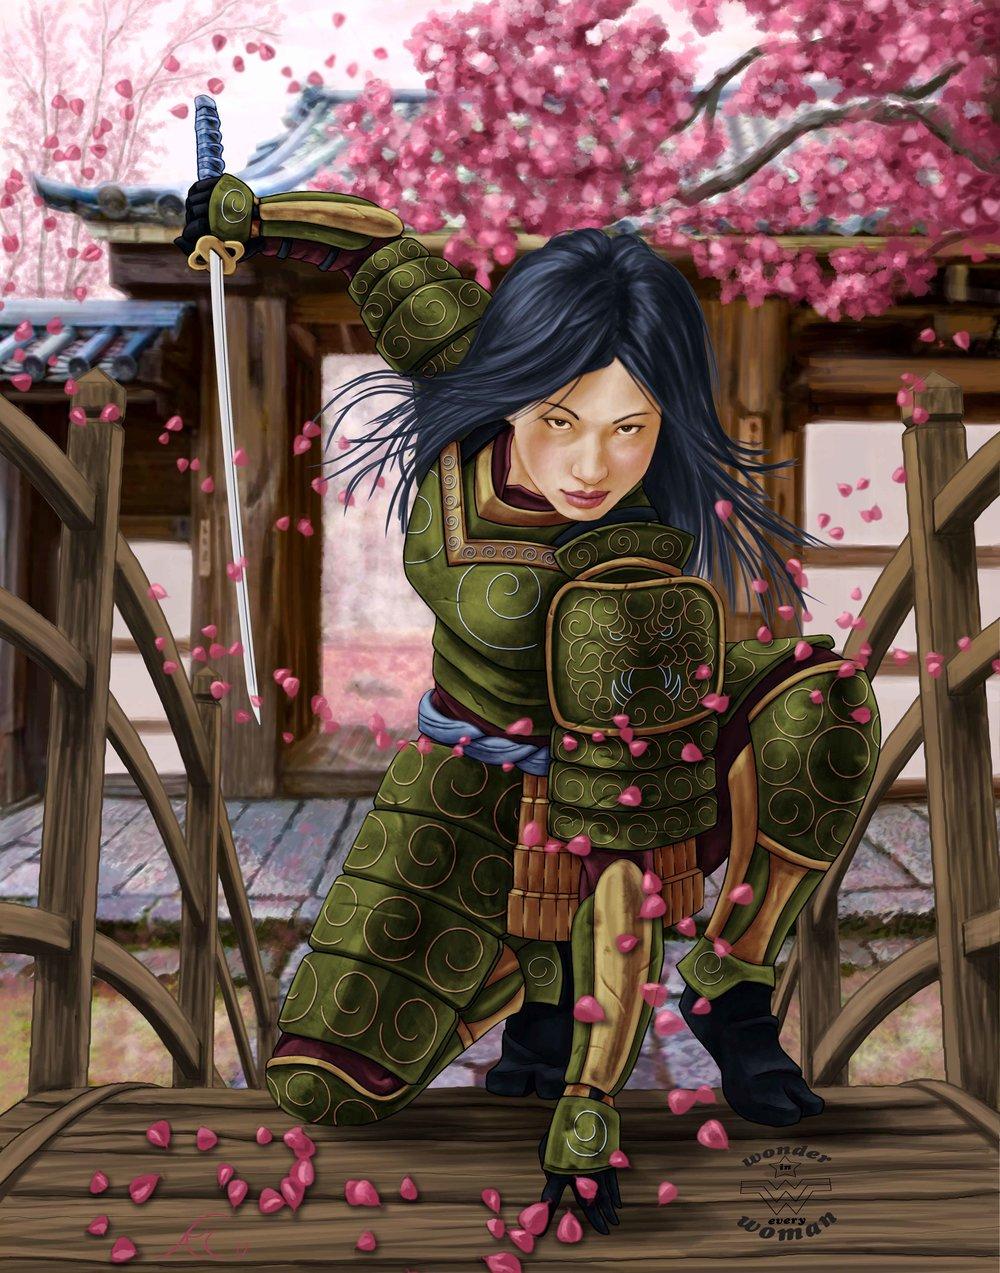 onna bugeisha - female samurai